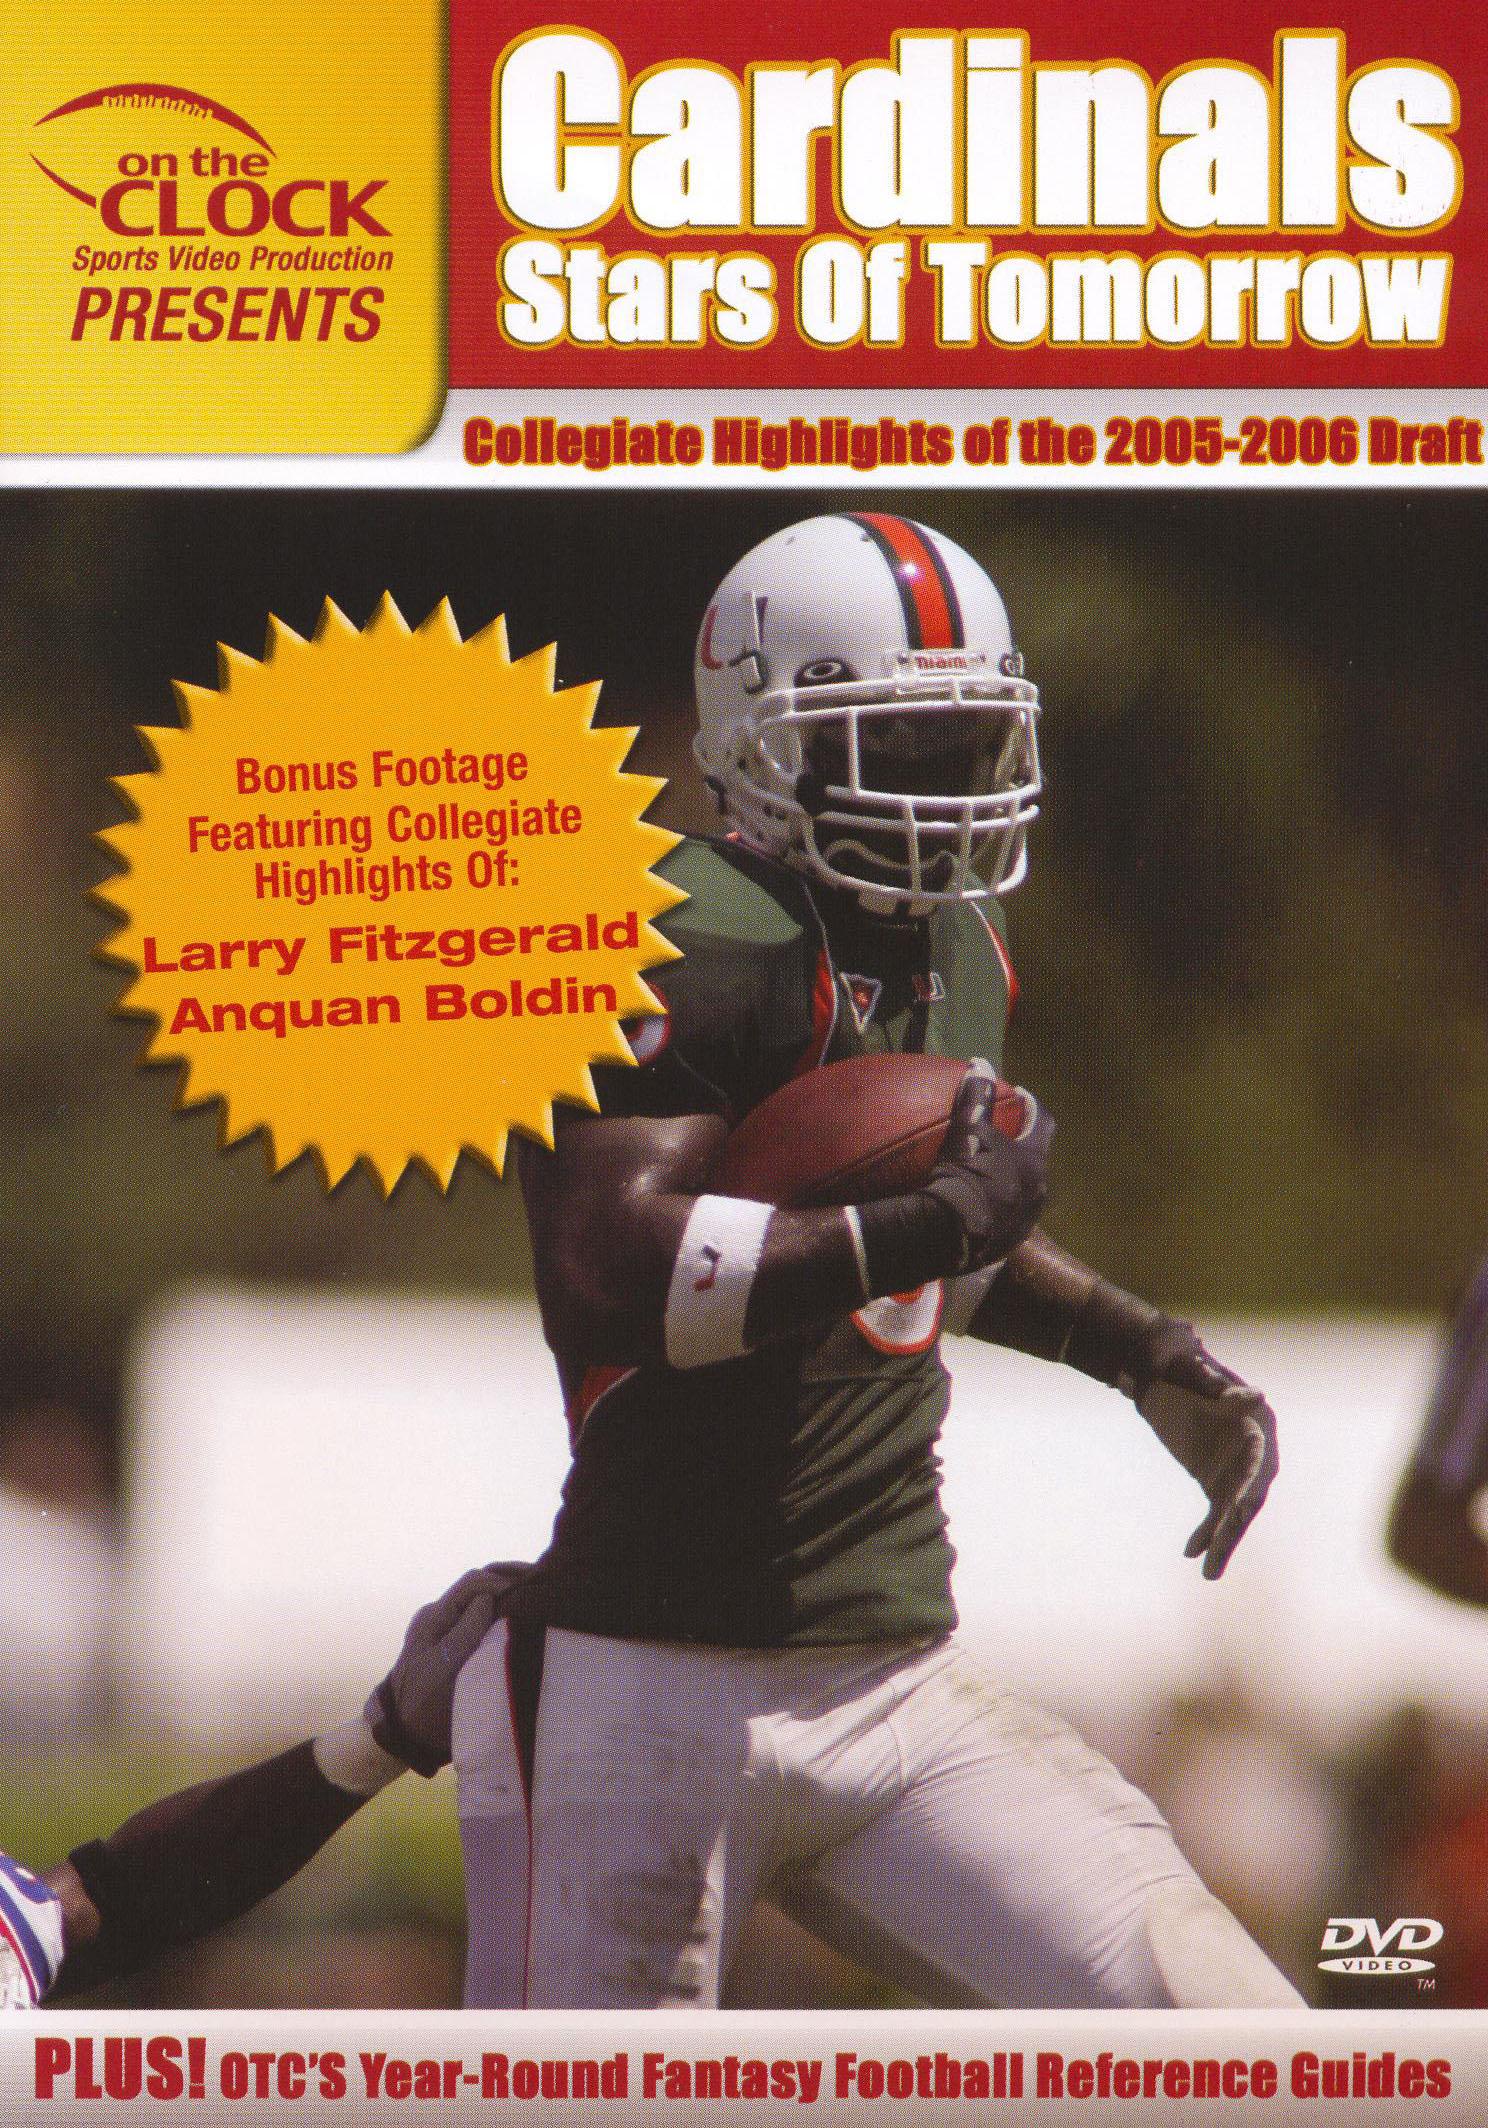 On the Clock Presents: Cardinals - 2005 Draft Picks Collegiate Highlights